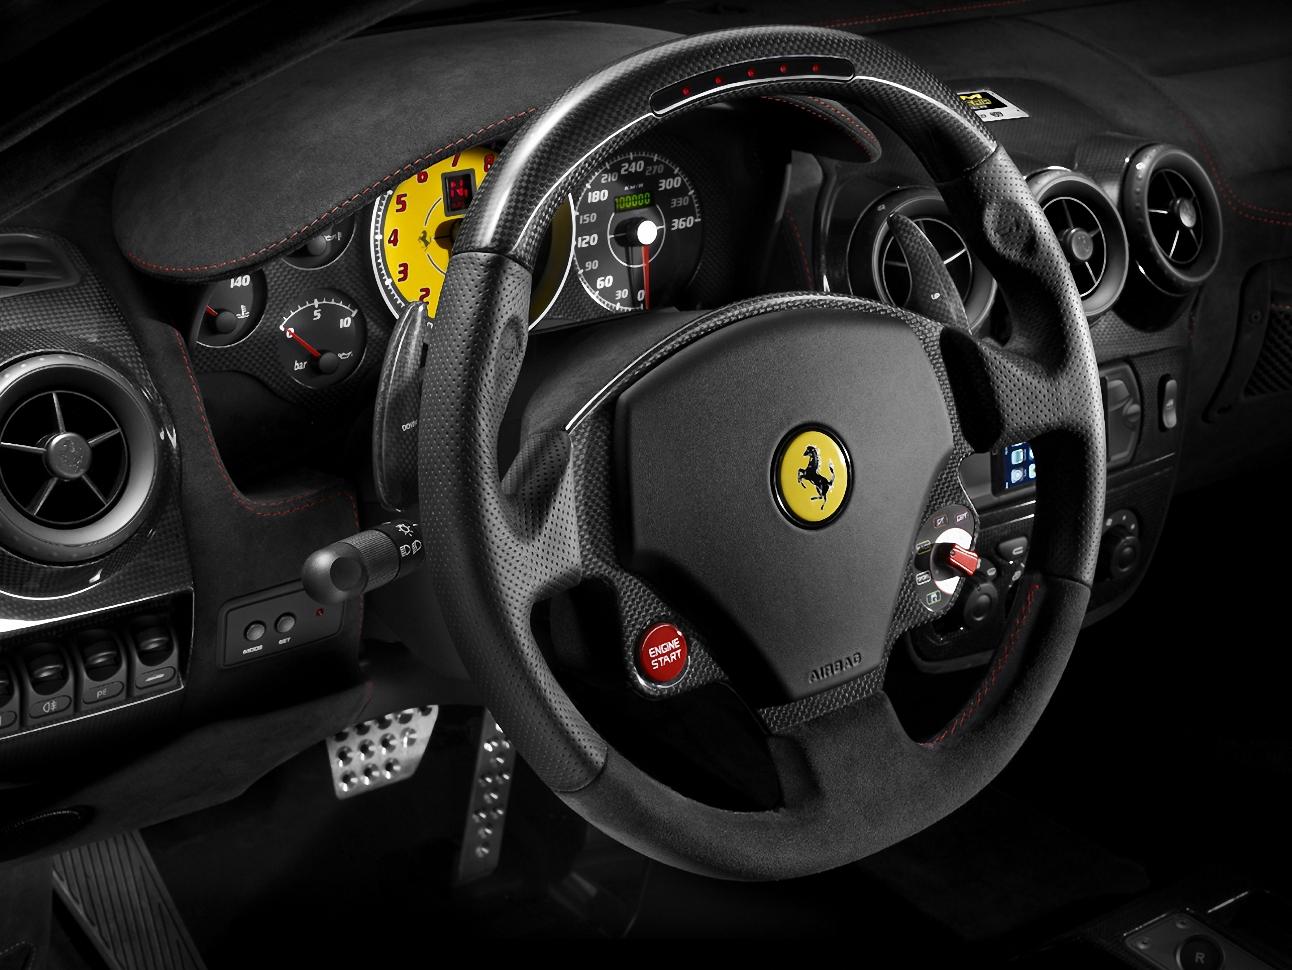 dream line ferrari f430 racing wheel review rh jancuxx blogspot com thrustmaster ferrari f430 force feedback manual manual volante thrustmaster ferrari f430